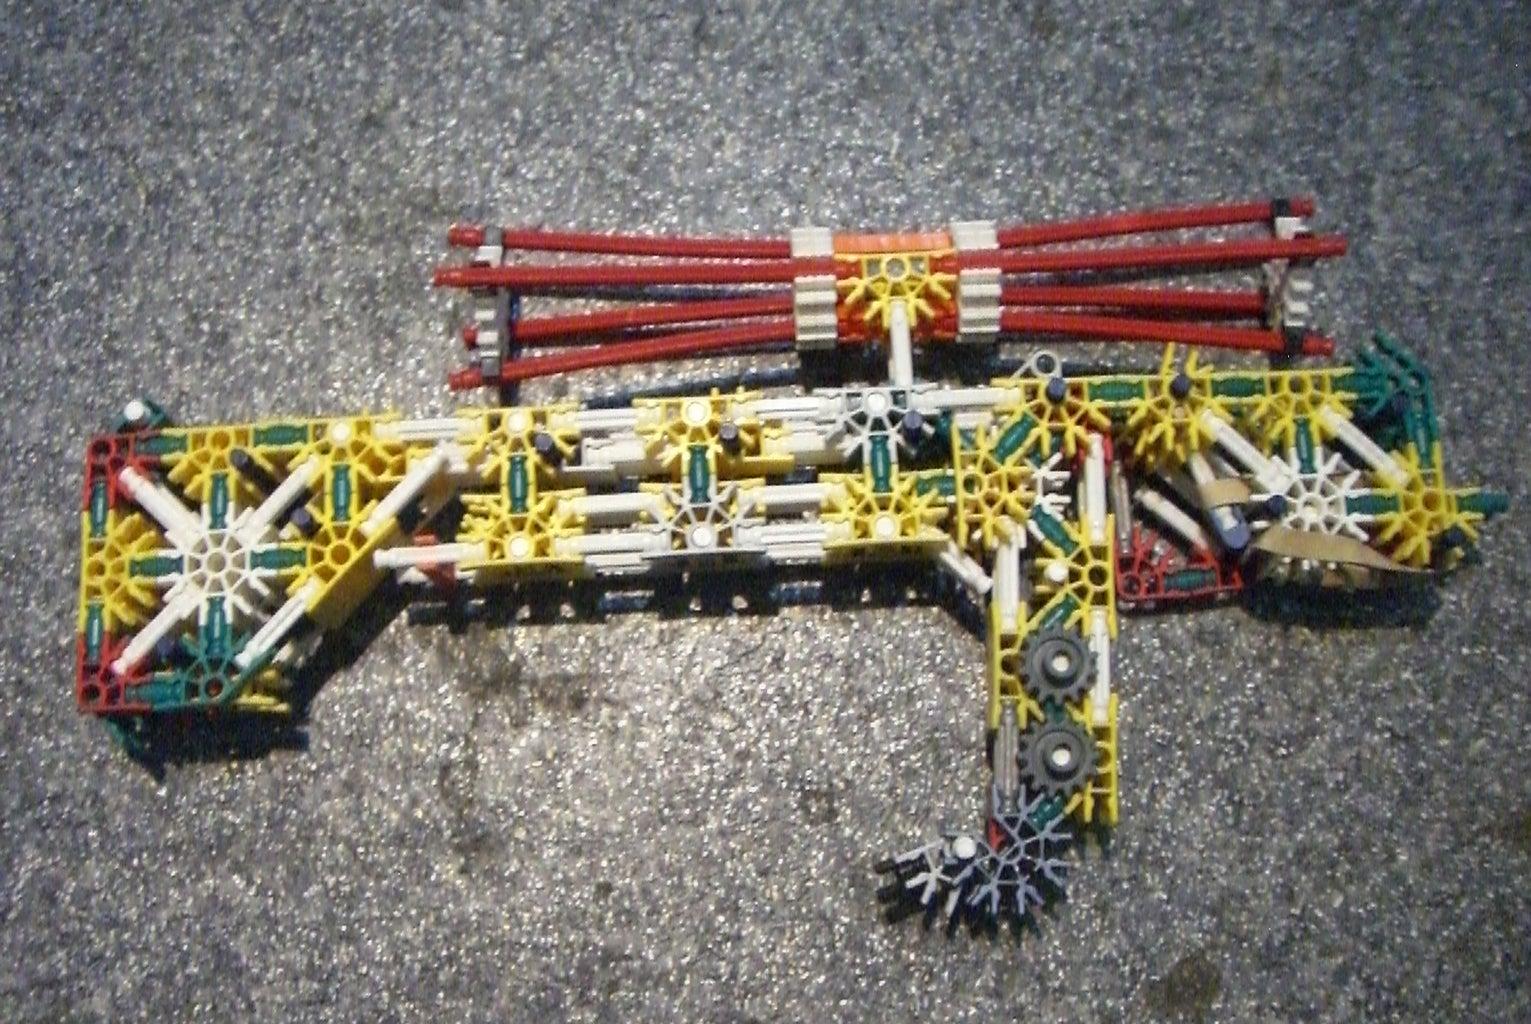 K'NEX Crossbow V1.0 Work in Progress